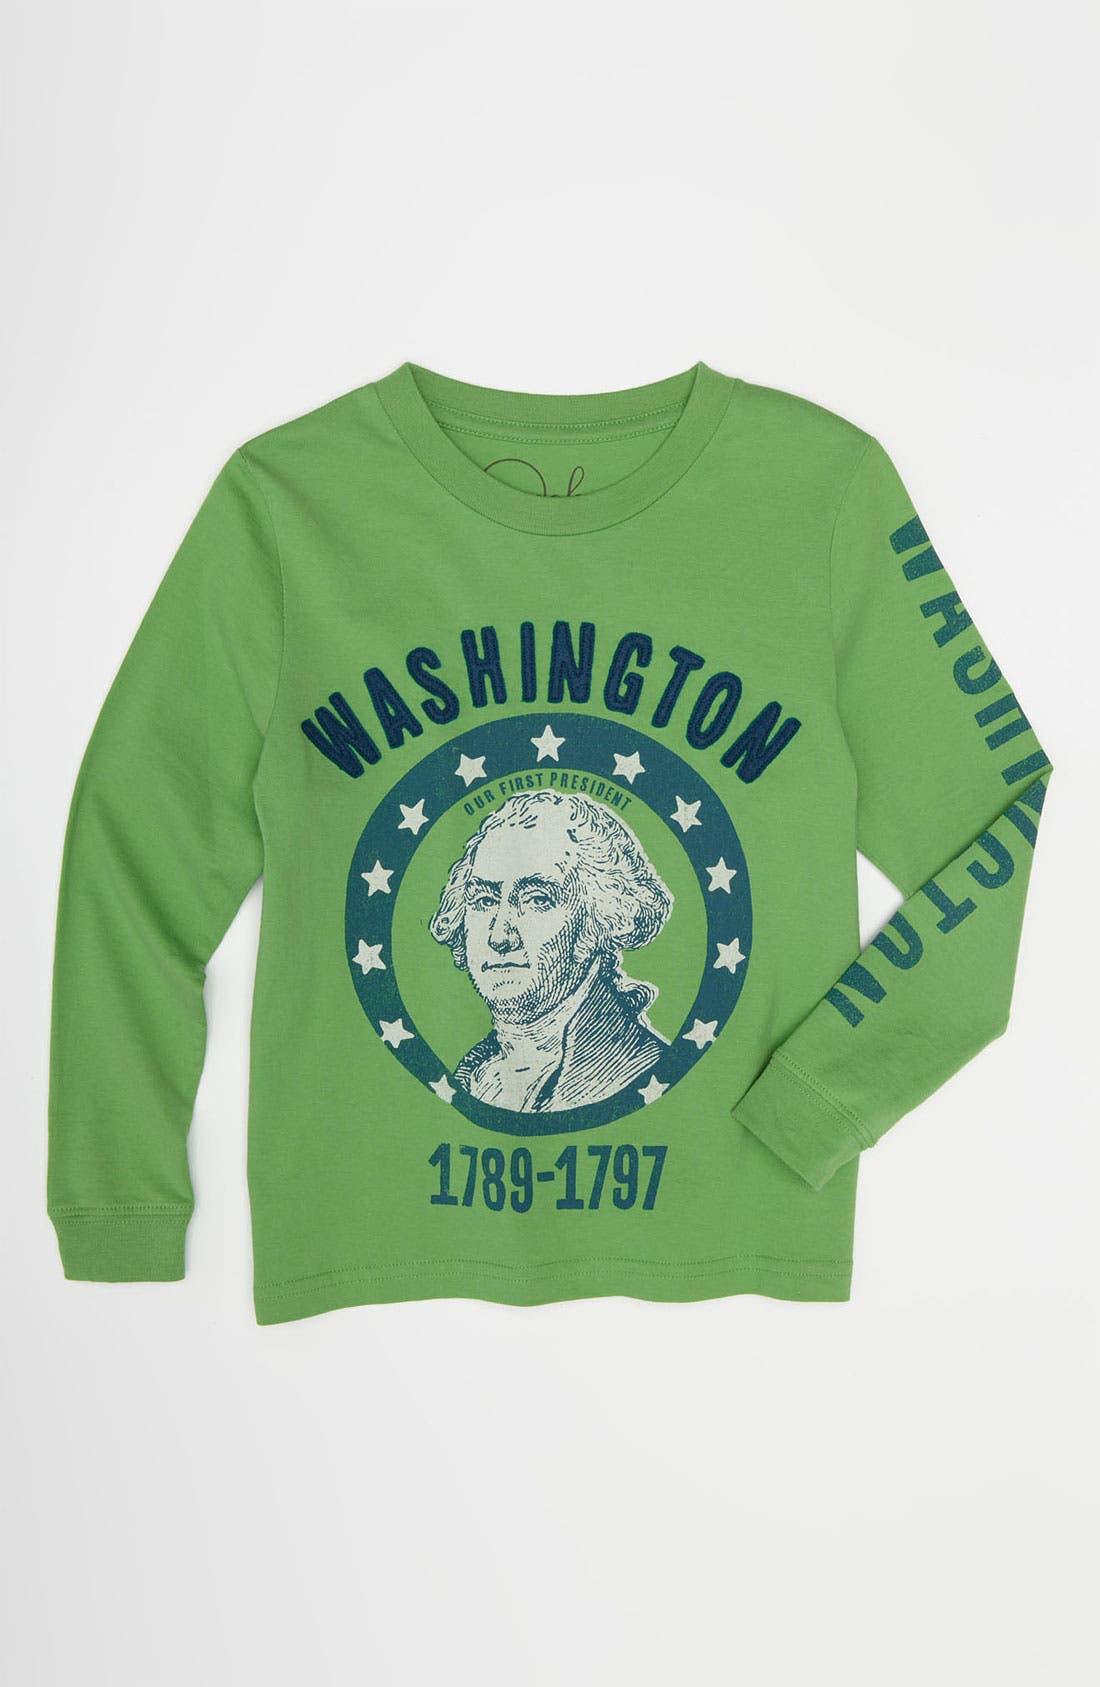 Alternate Image 1 Selected - Peek 'Washington' T-Shirt (Toddler, Little Boys & Big Boys)